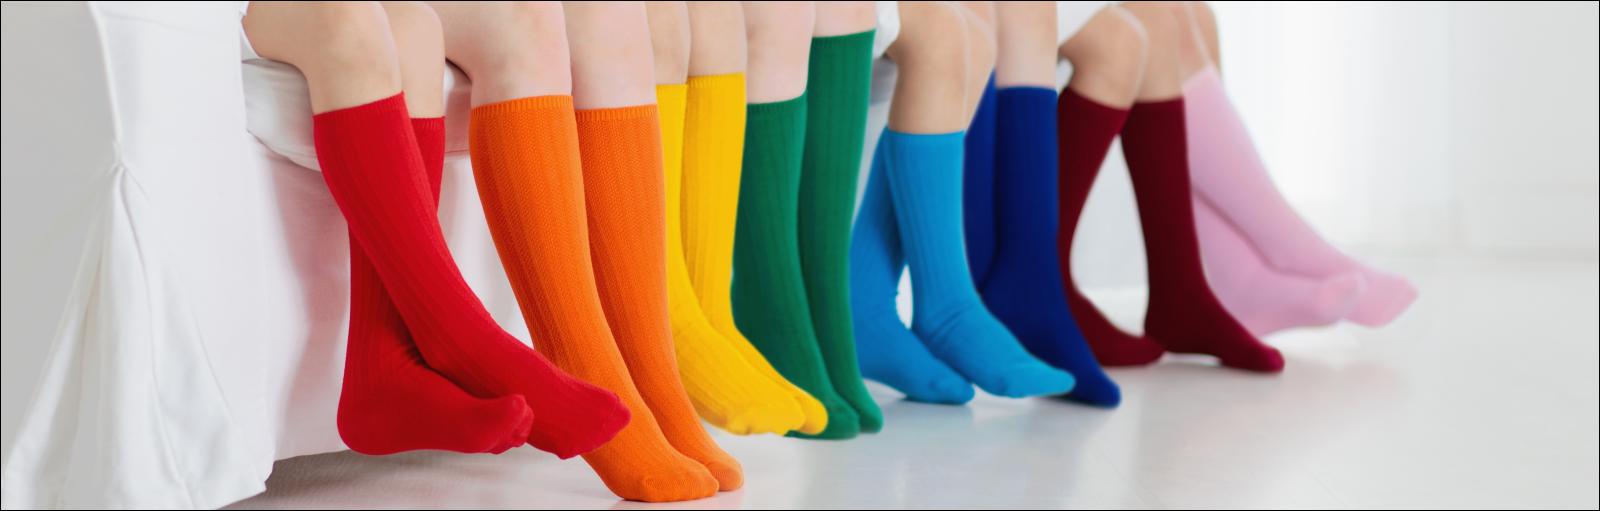 Kids wearing colorful rainbow socks